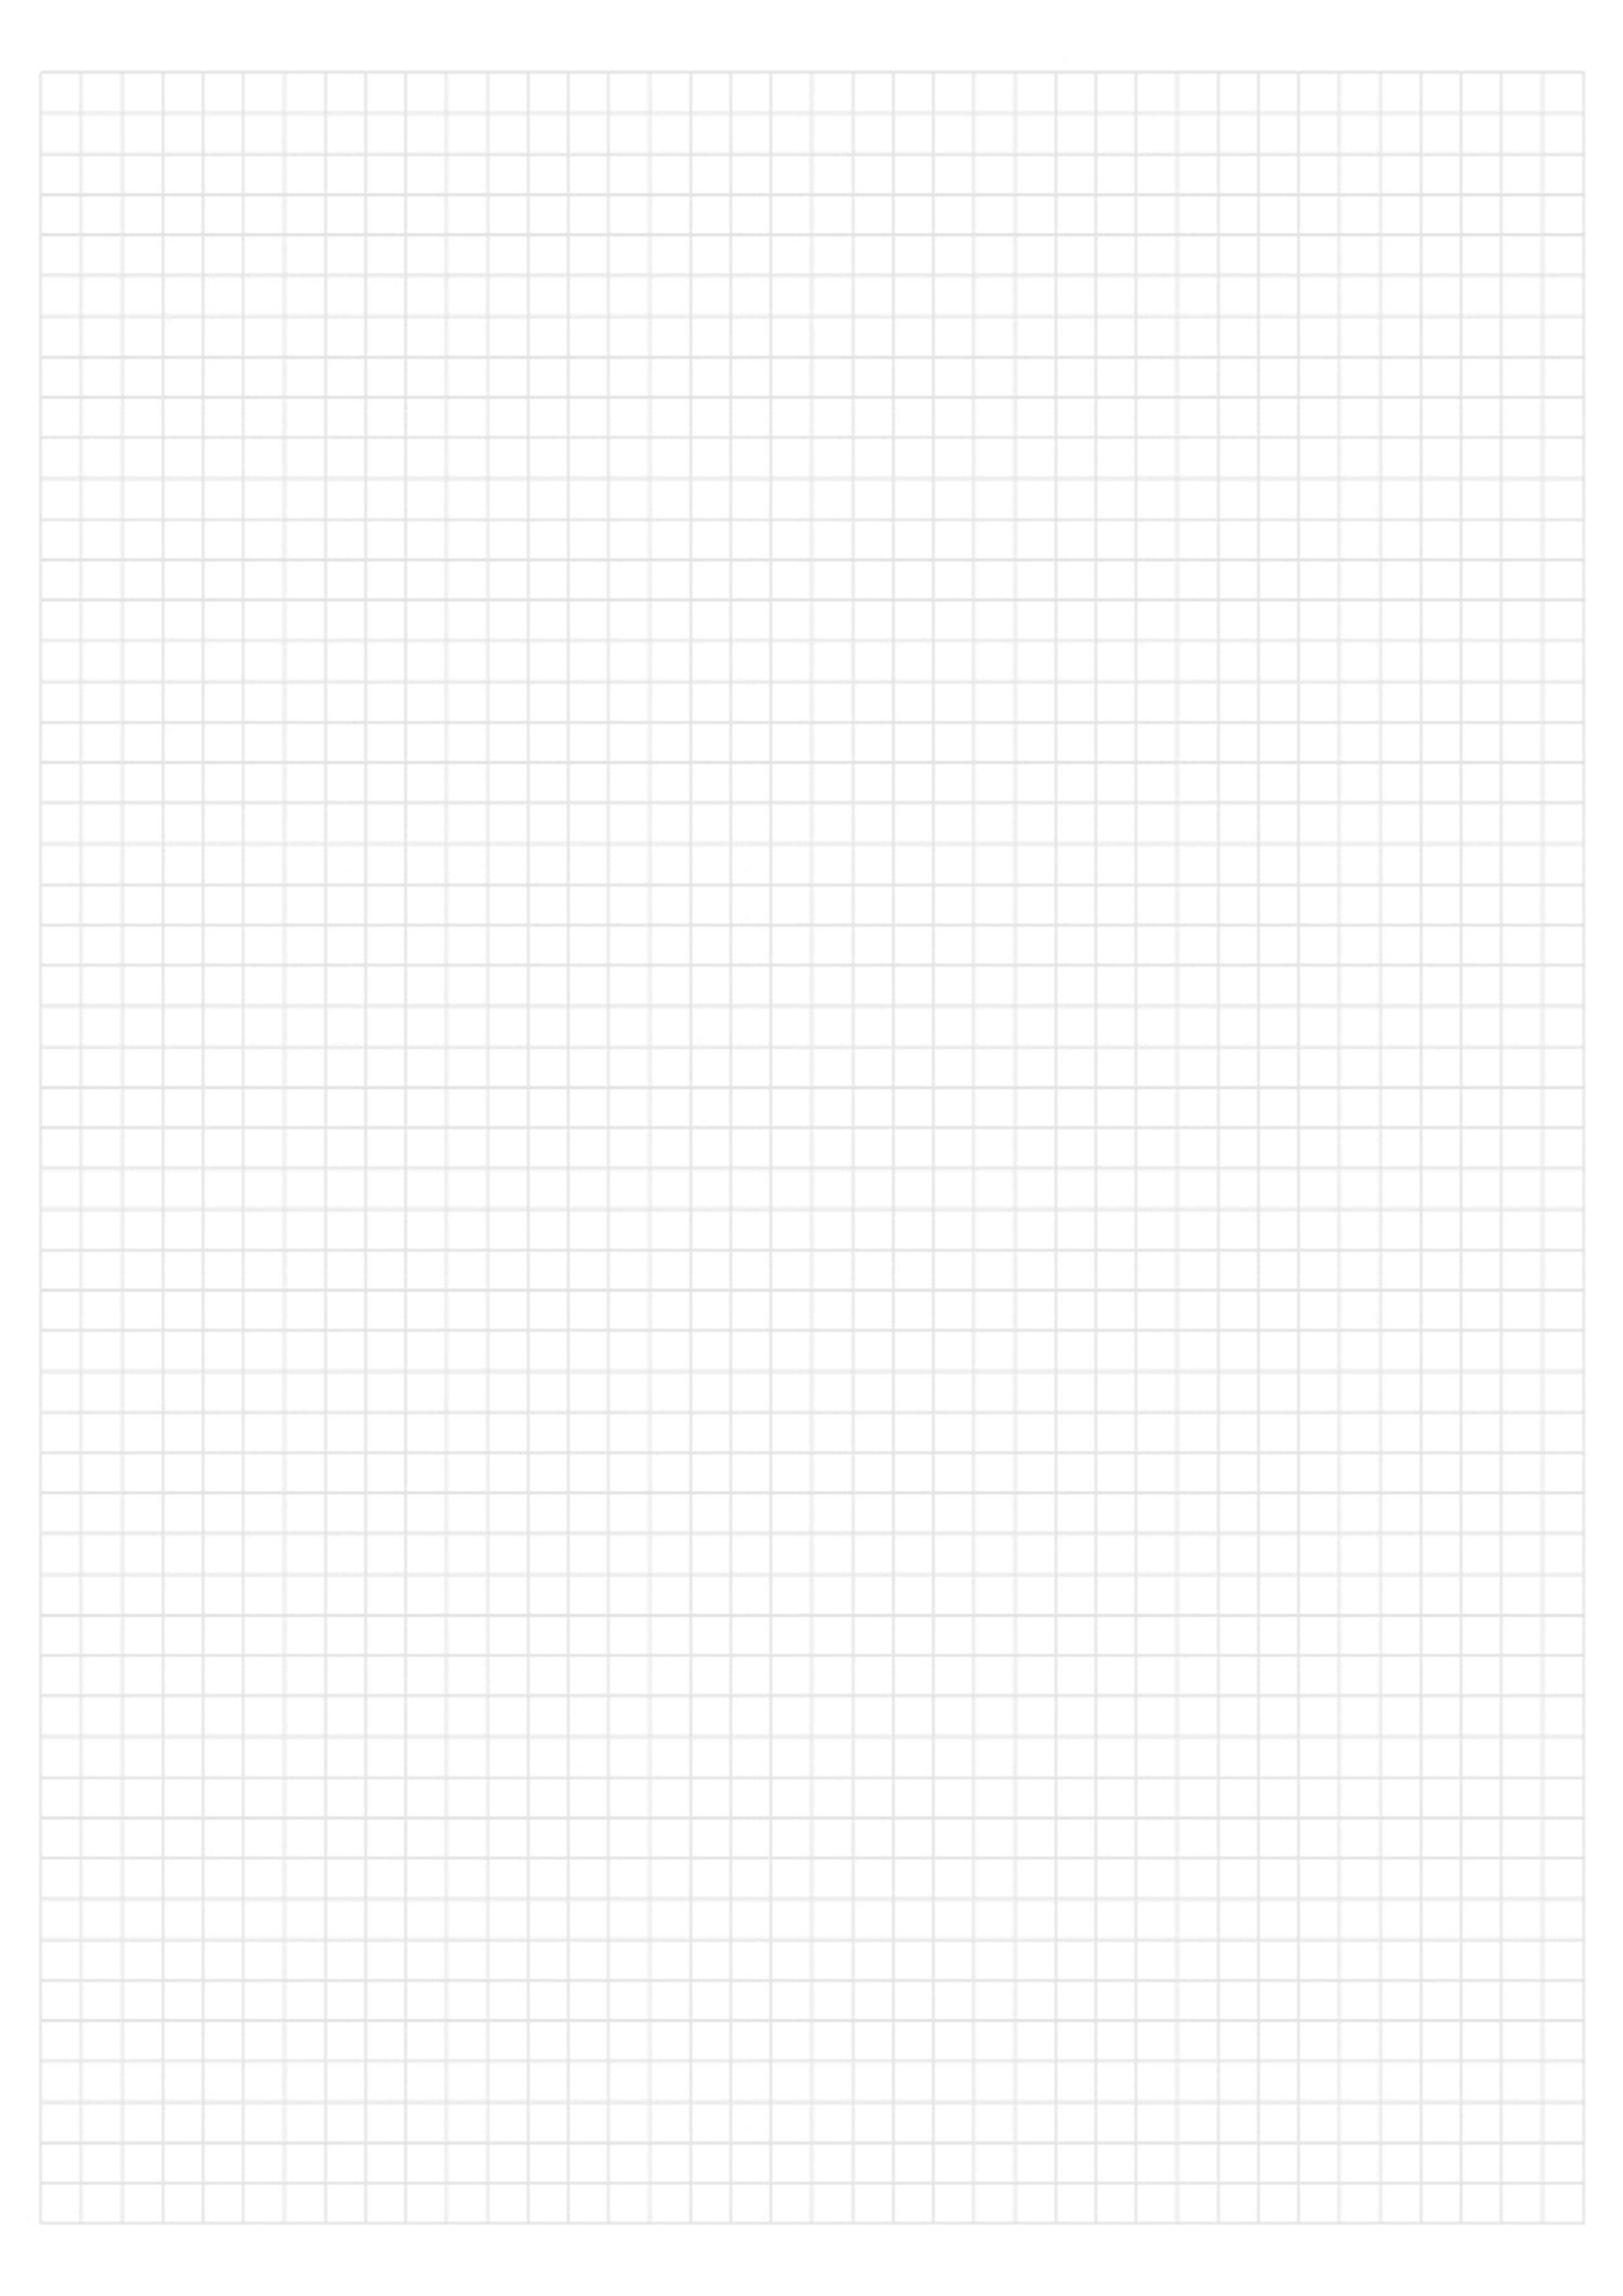 Folha Quadriculada Para Imprimir Planner Papel Quadriculado Para